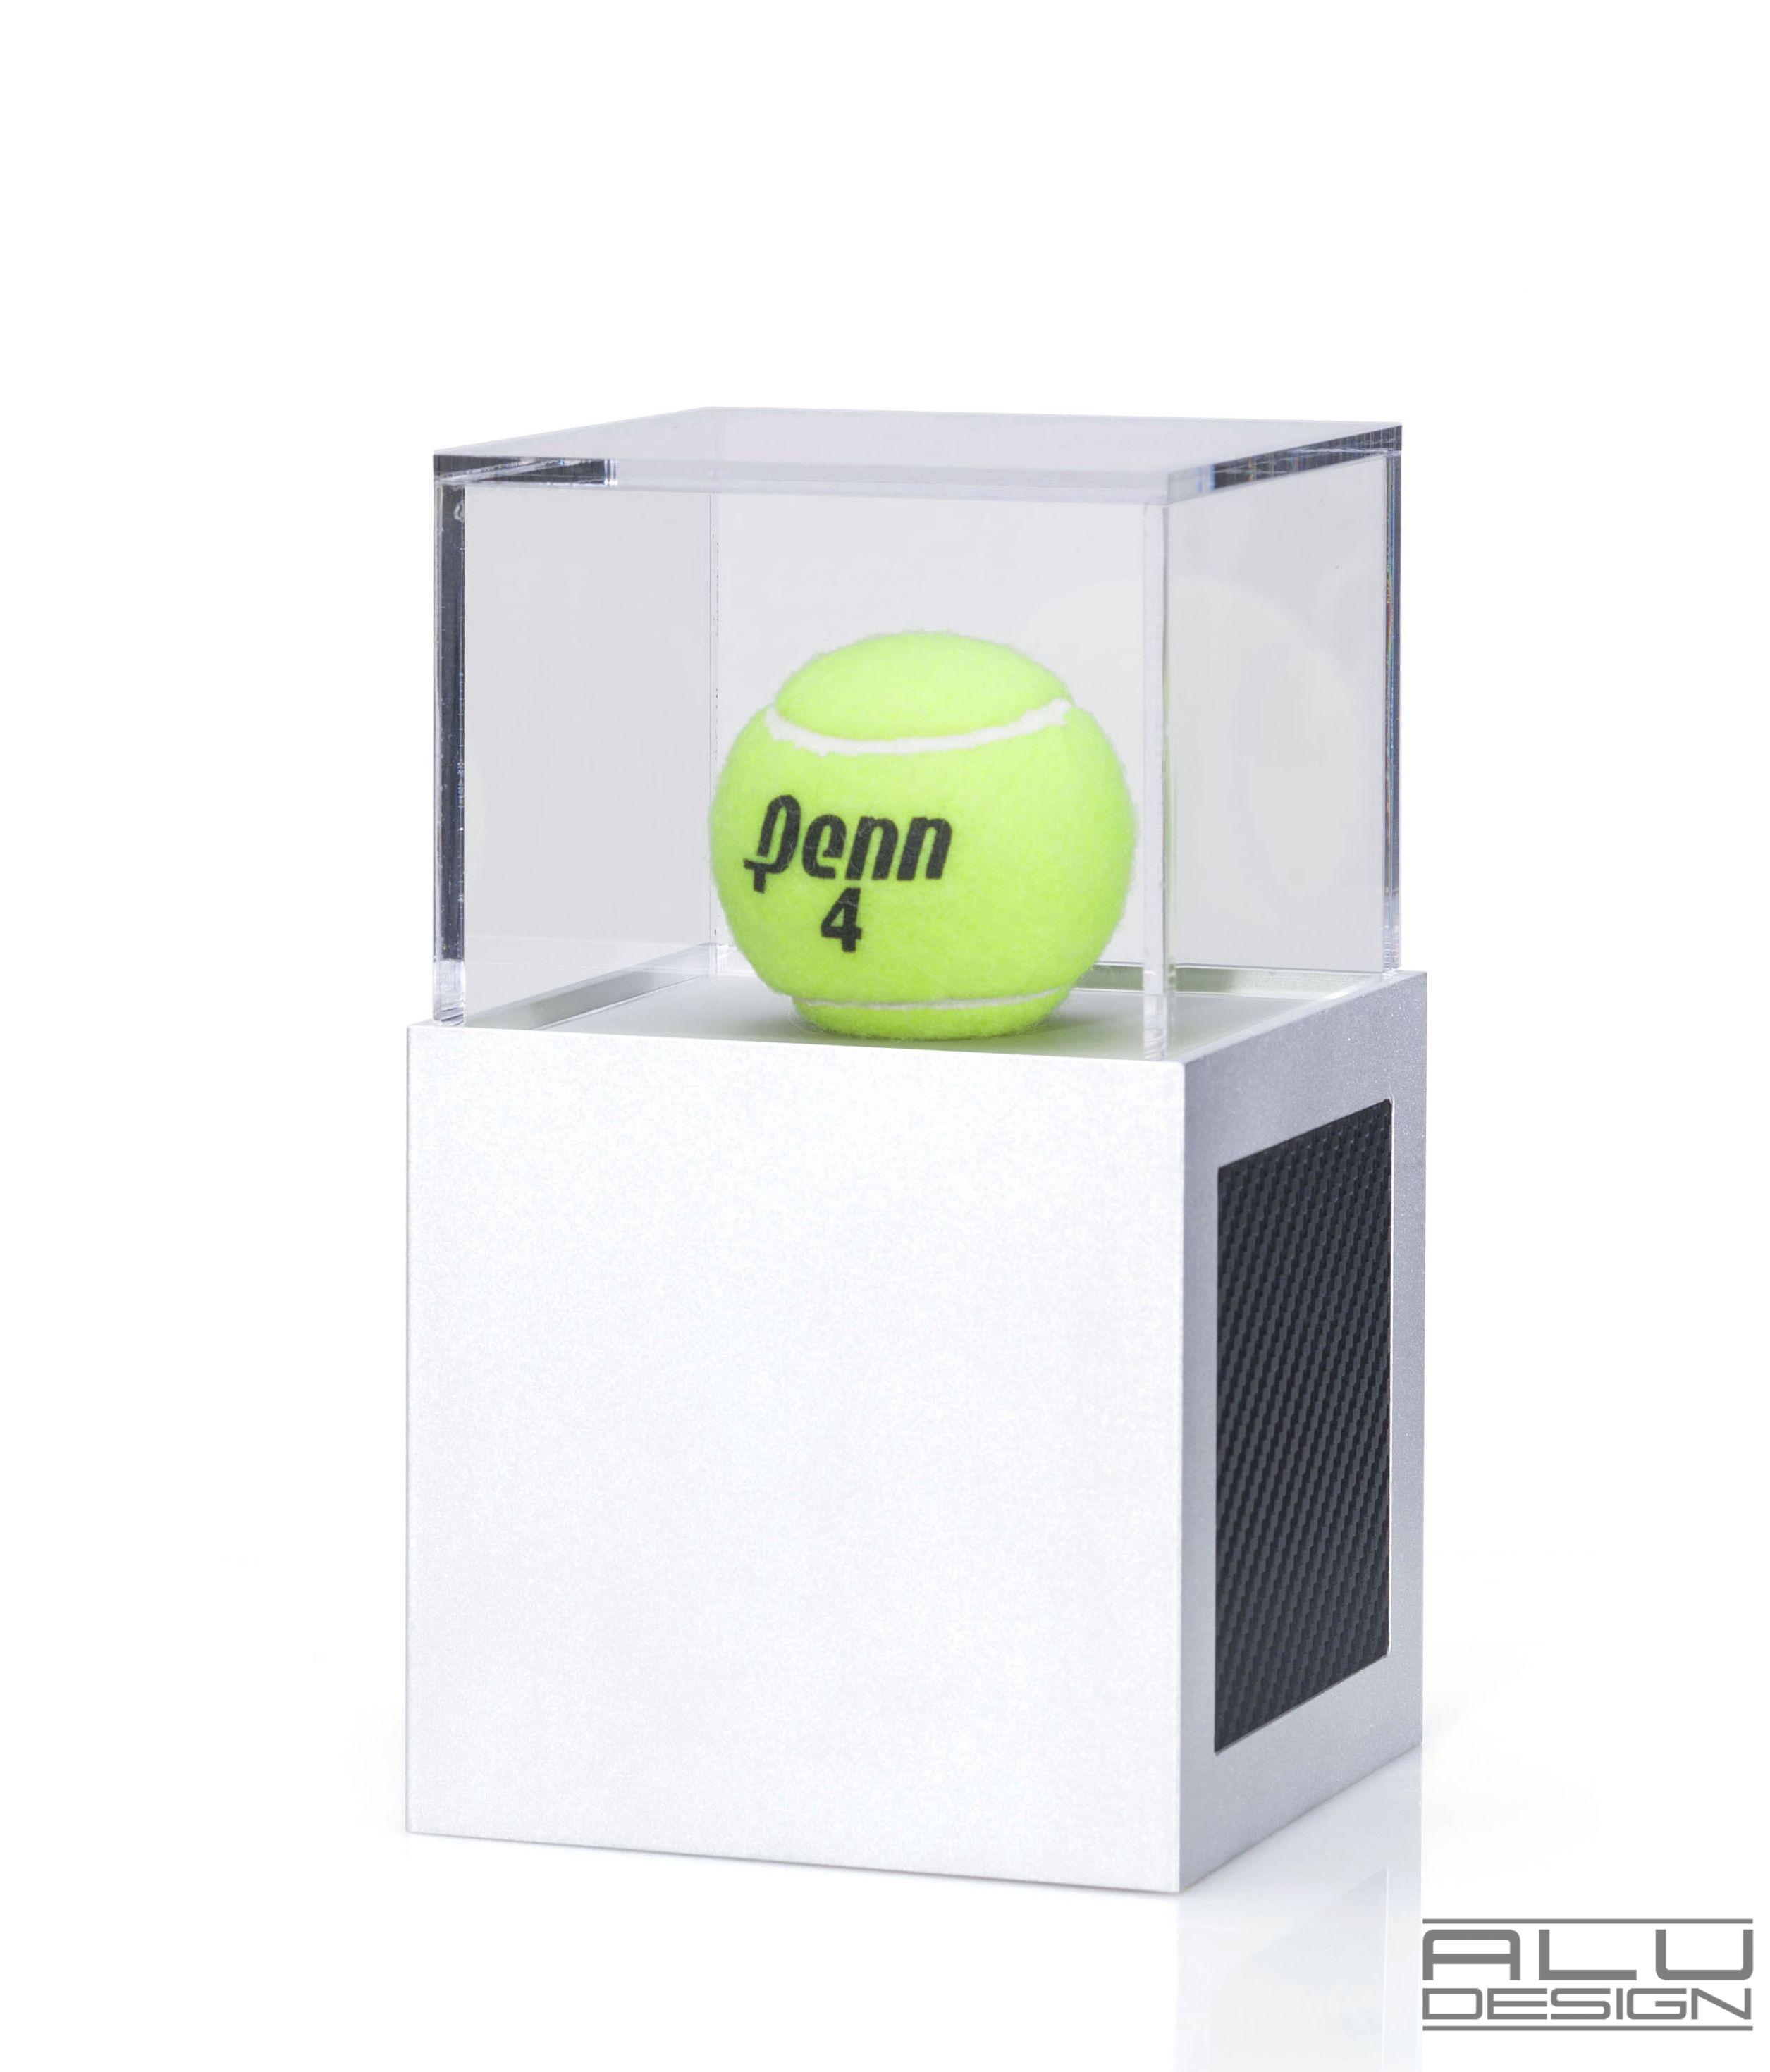 A Modern Tennis Ball Display Case Anodized Silver Aluminum